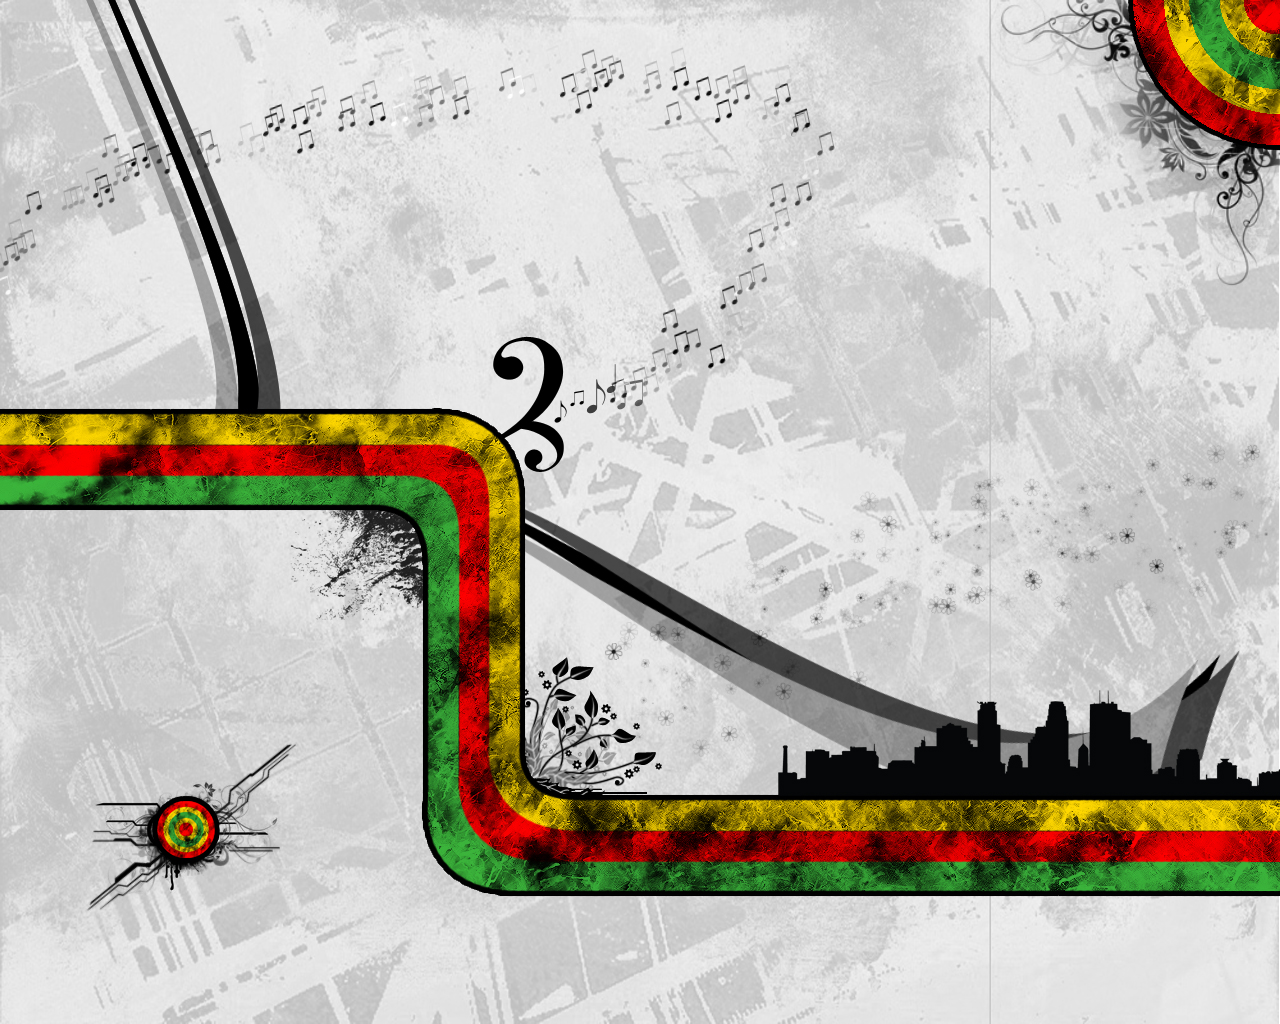 http://1.bp.blogspot.com/-88QeRH15jxk/UOzU9VViFGI/AAAAAAAAKJg/YVycboD6YZs/s1600/Wallpaper+-+Reggae+-+04+Create+Mania.jpg